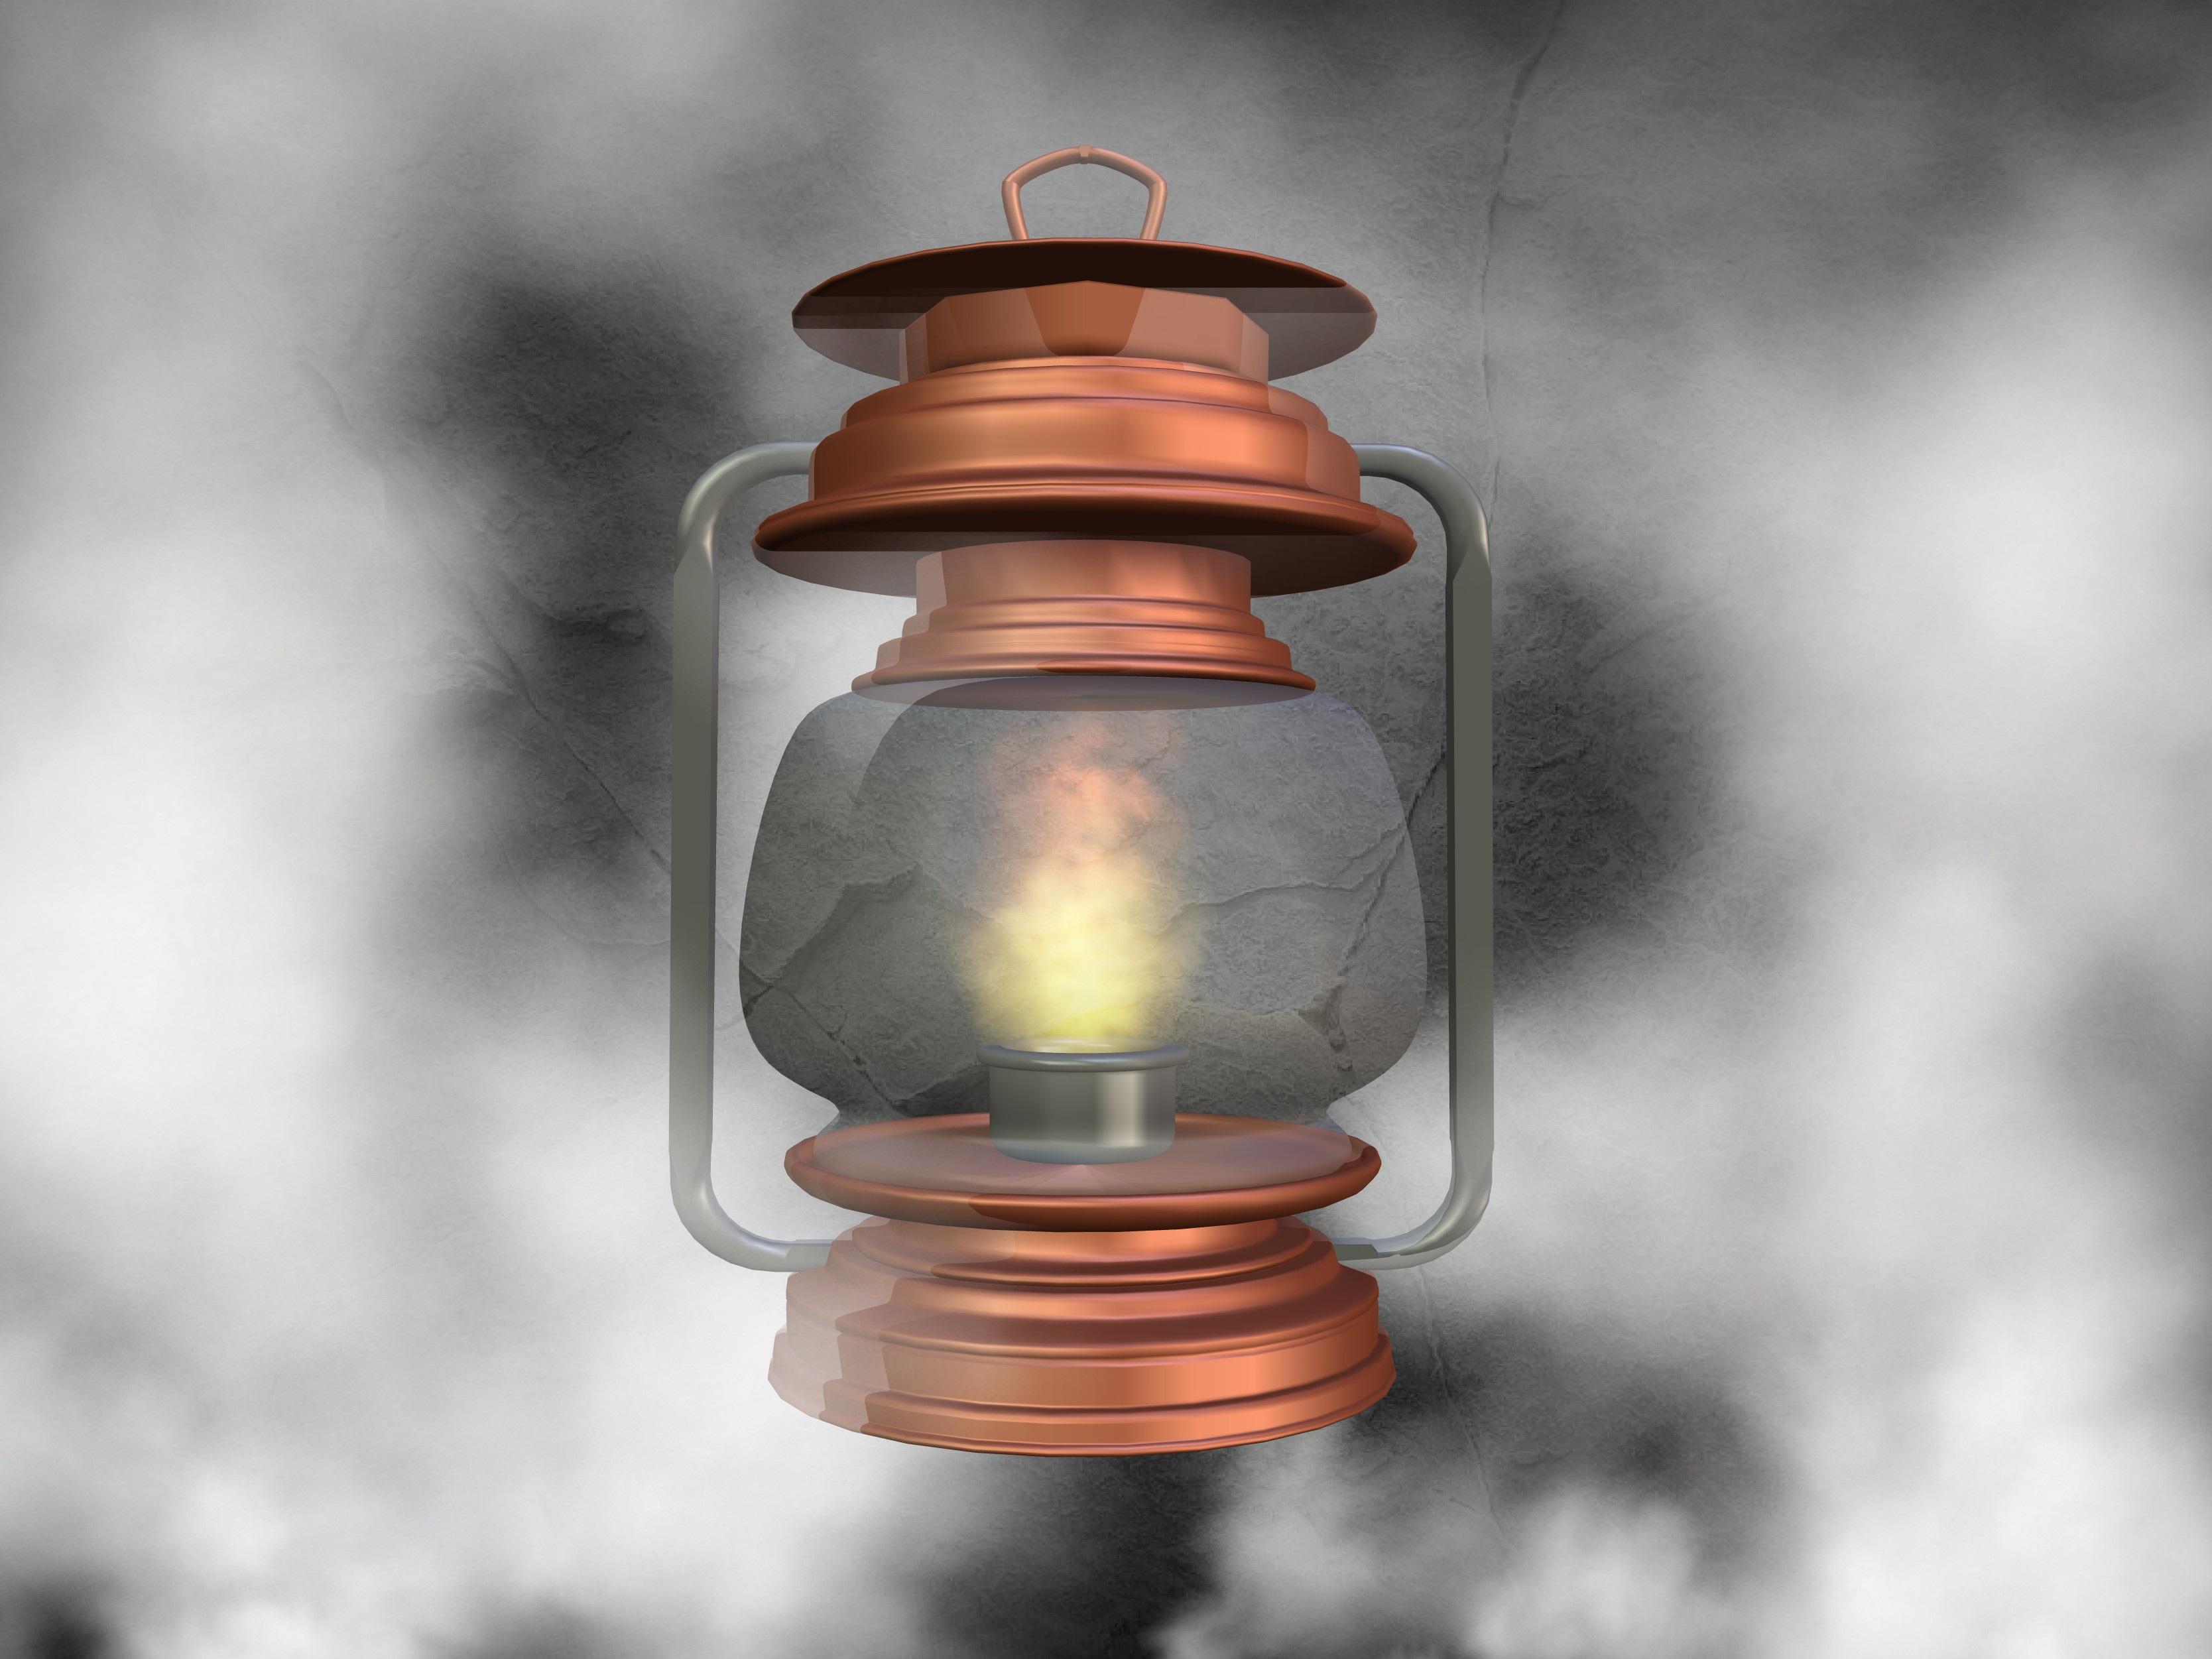 light lantern street light lamp lighting light fixture oil lamp foggy weather incandescent light bulb 699162 5 Inspirant Lampe Eclairage Uqw1